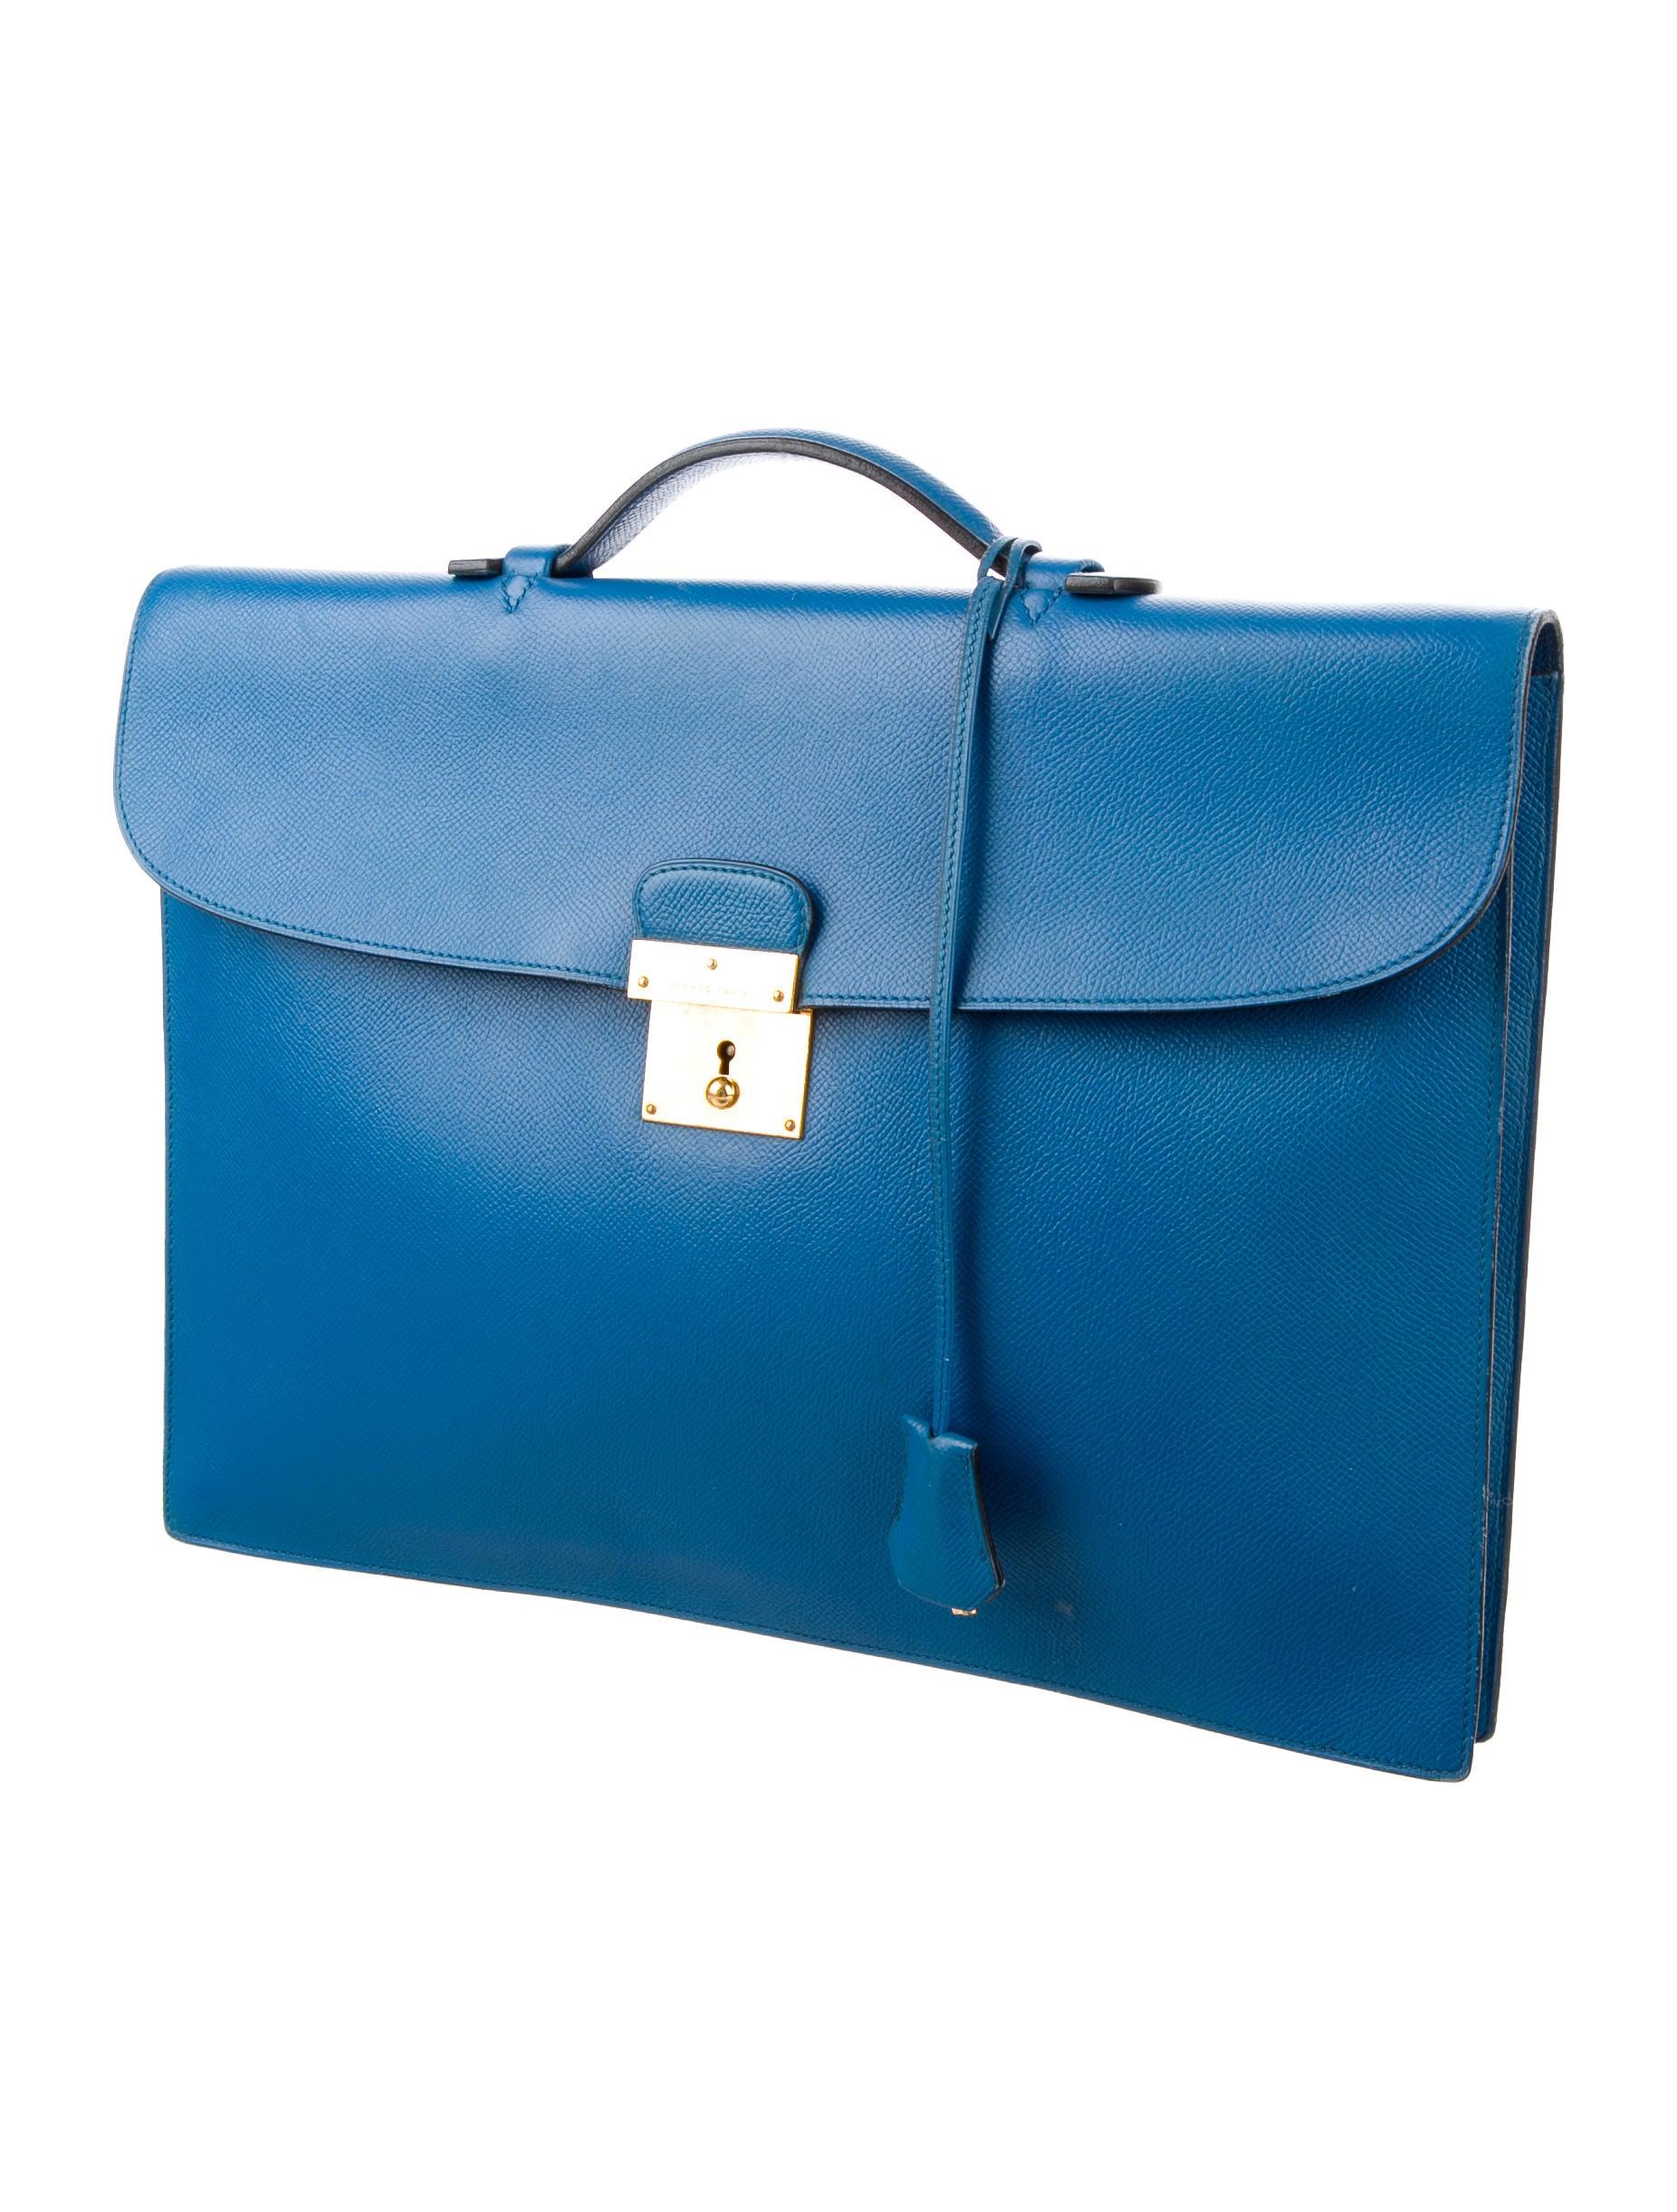 Hermes vintage quirus document holder bags her89921 for Document holder bag